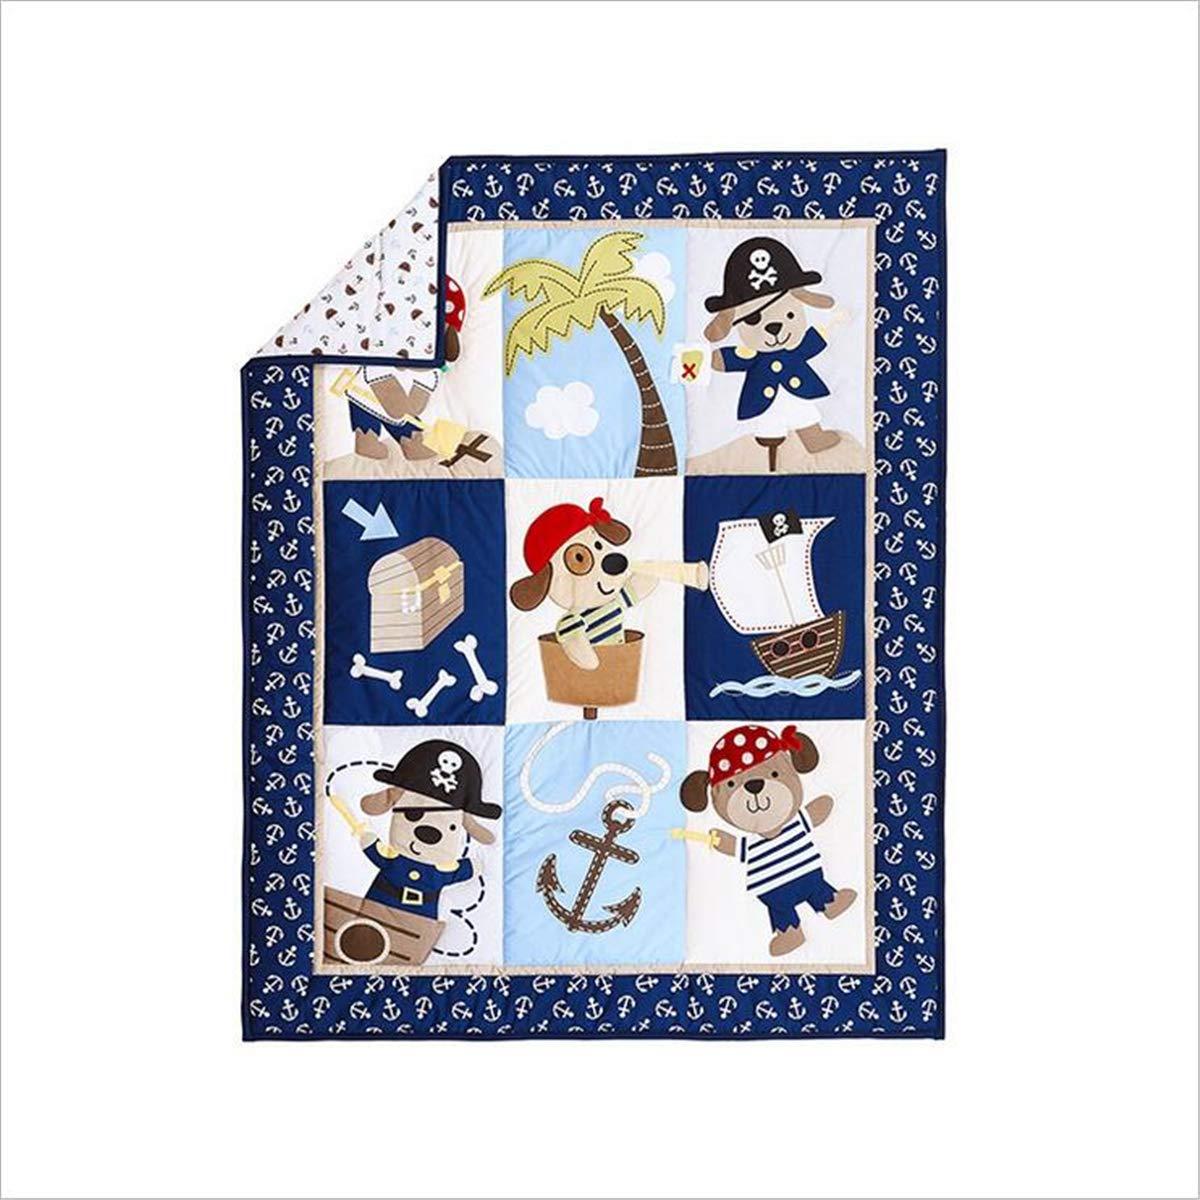 WINLIFE ベビーベッド寝具セット 女の子&男の子用 ベビーベッドキルト 33インチ×42インチ ベビーキルト  海賊 B07K8KPTXK